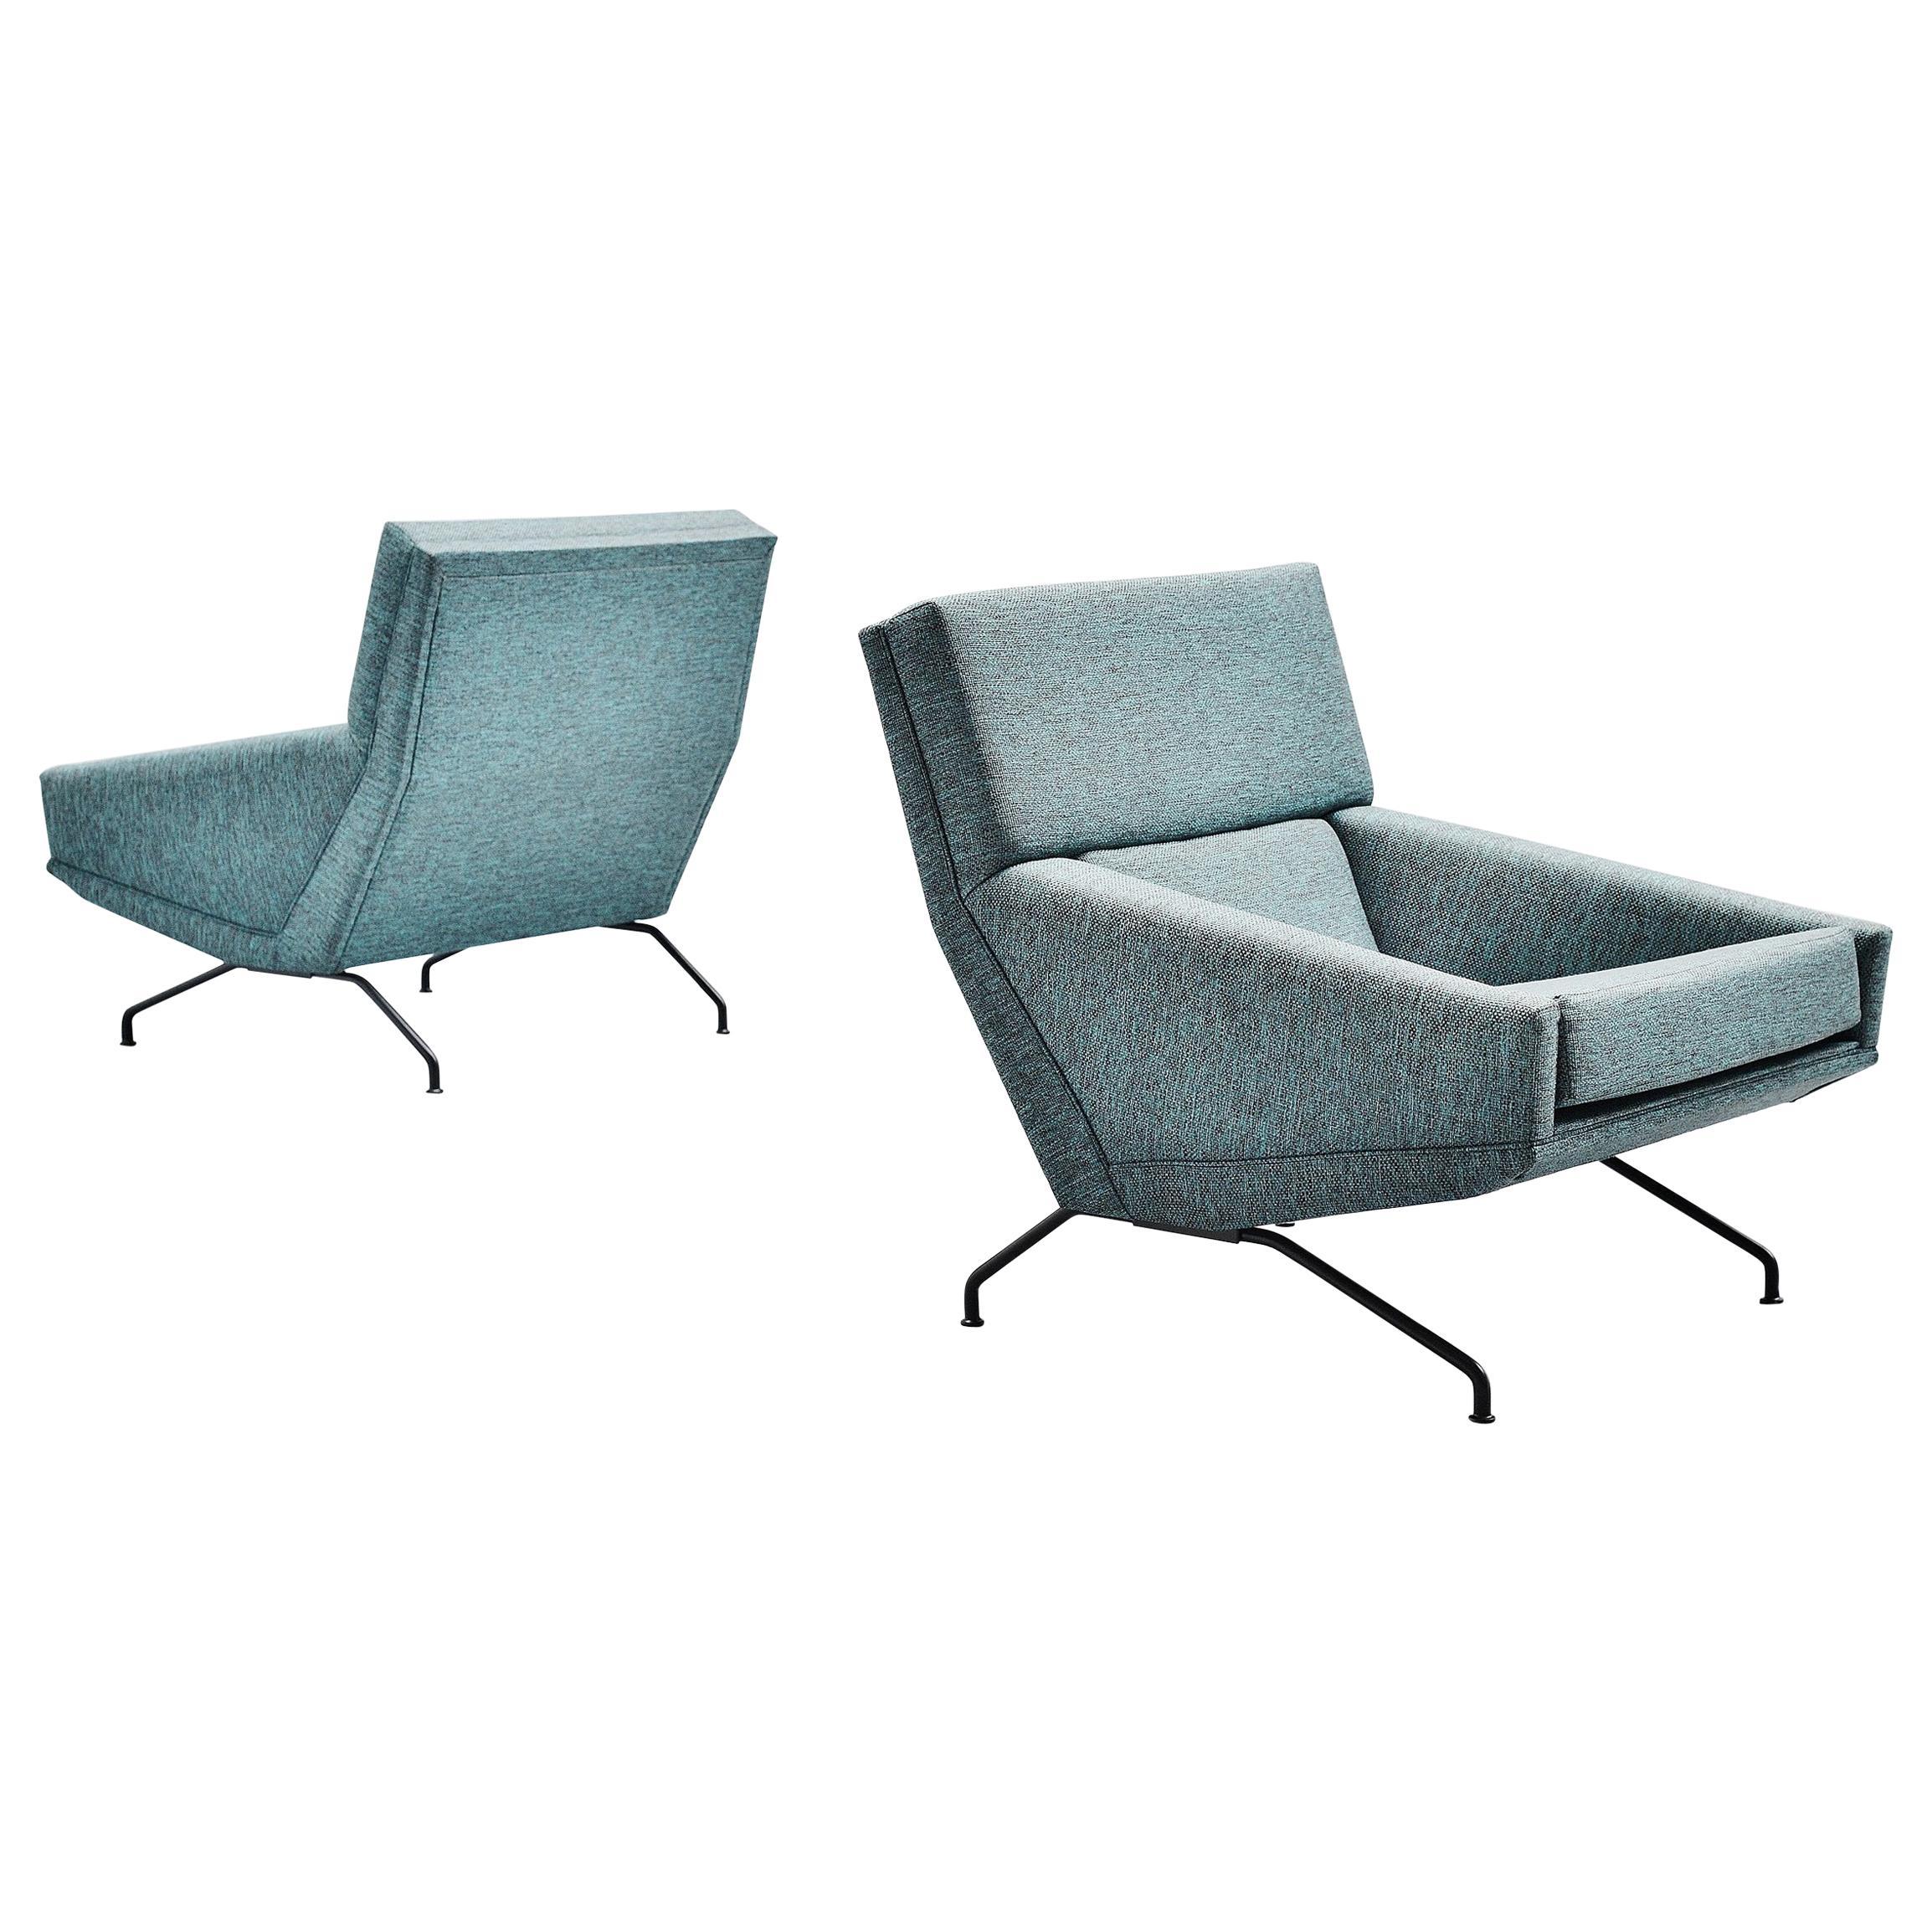 Georges van Rijck Lounge Chairs Beaufort Belgium 1960